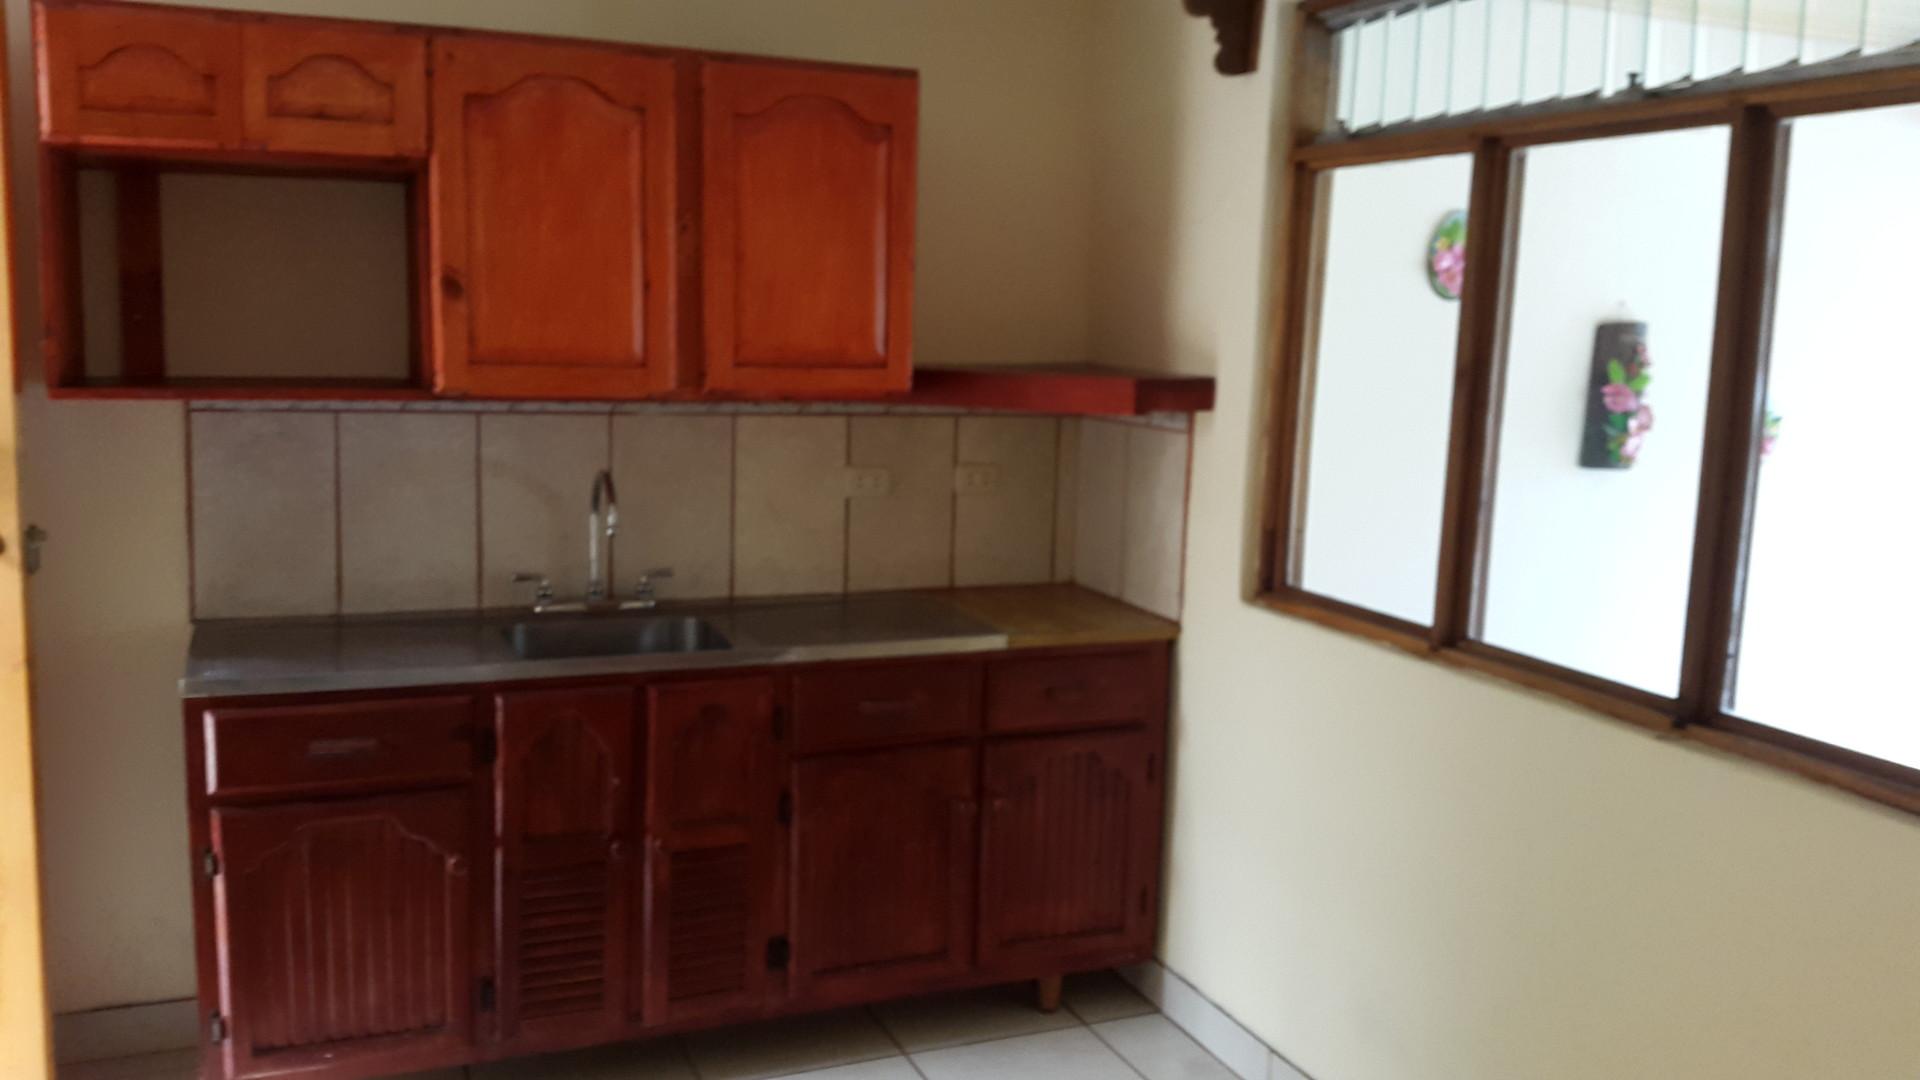 apartamento-estudio-hermoso-seguro-centrico-dcd0f0754c46aefee6a647d5f7a19842